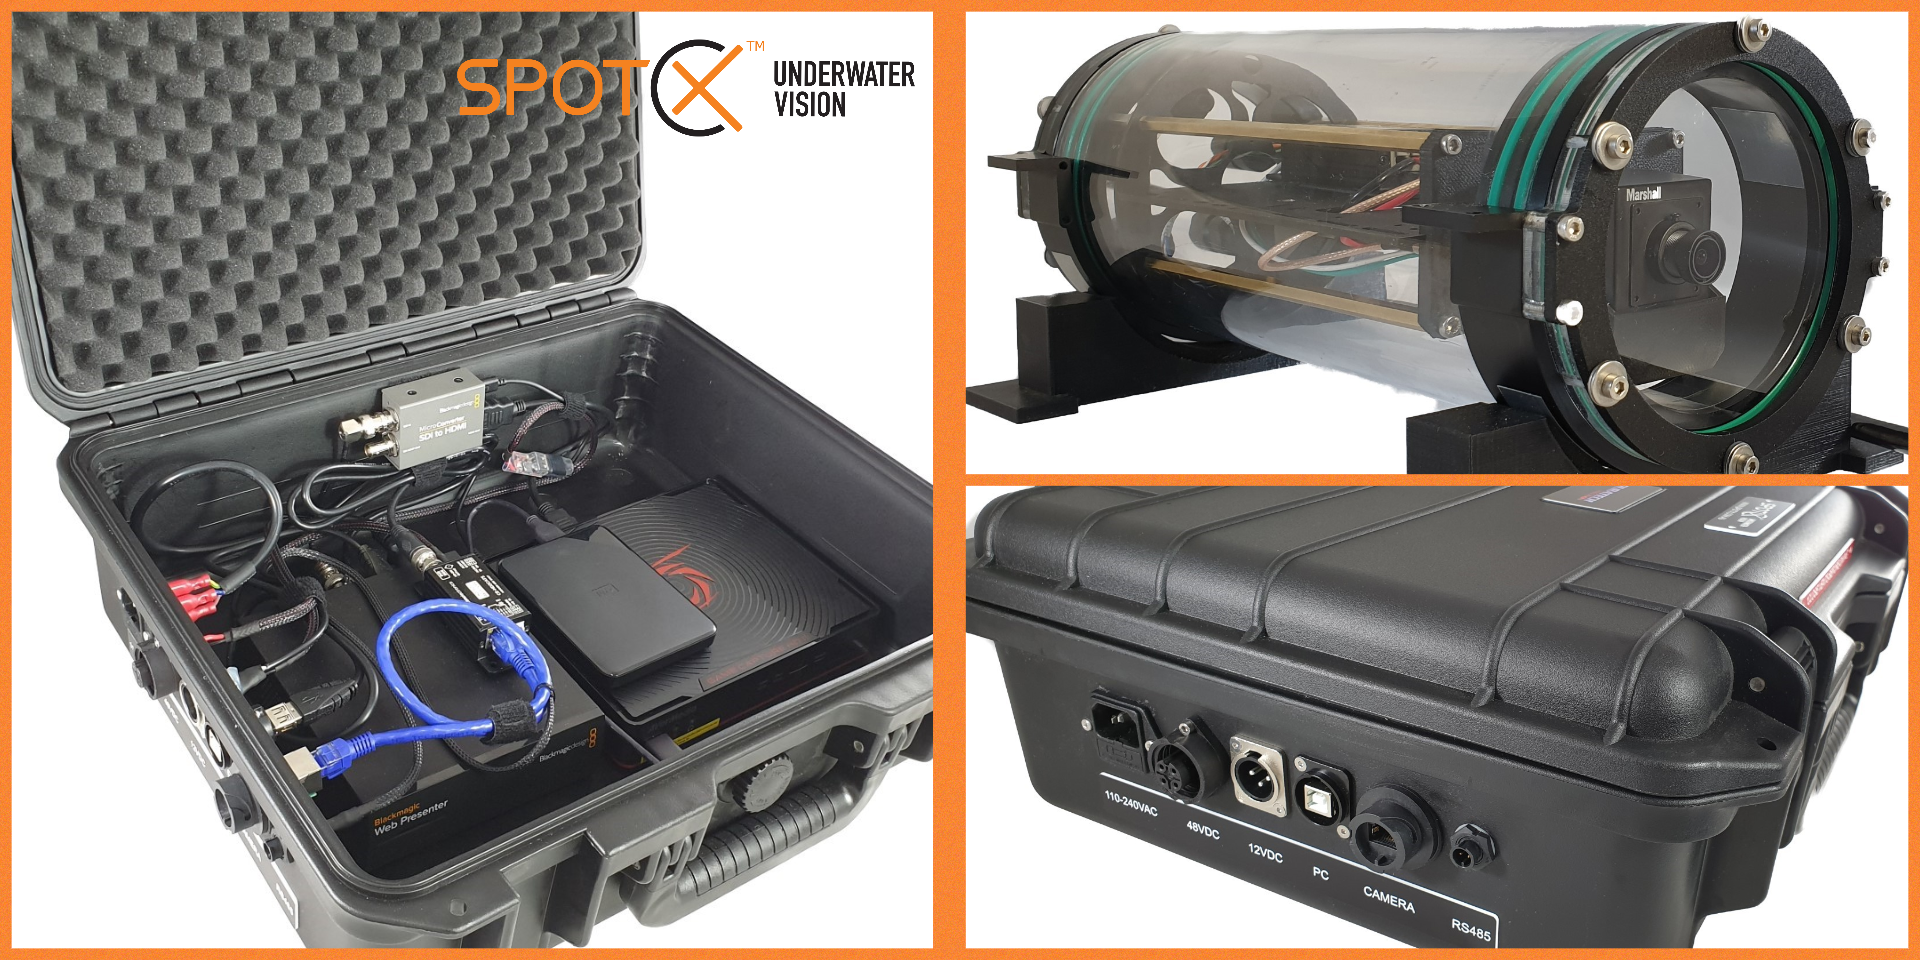 Spot X Live Web Streaming System